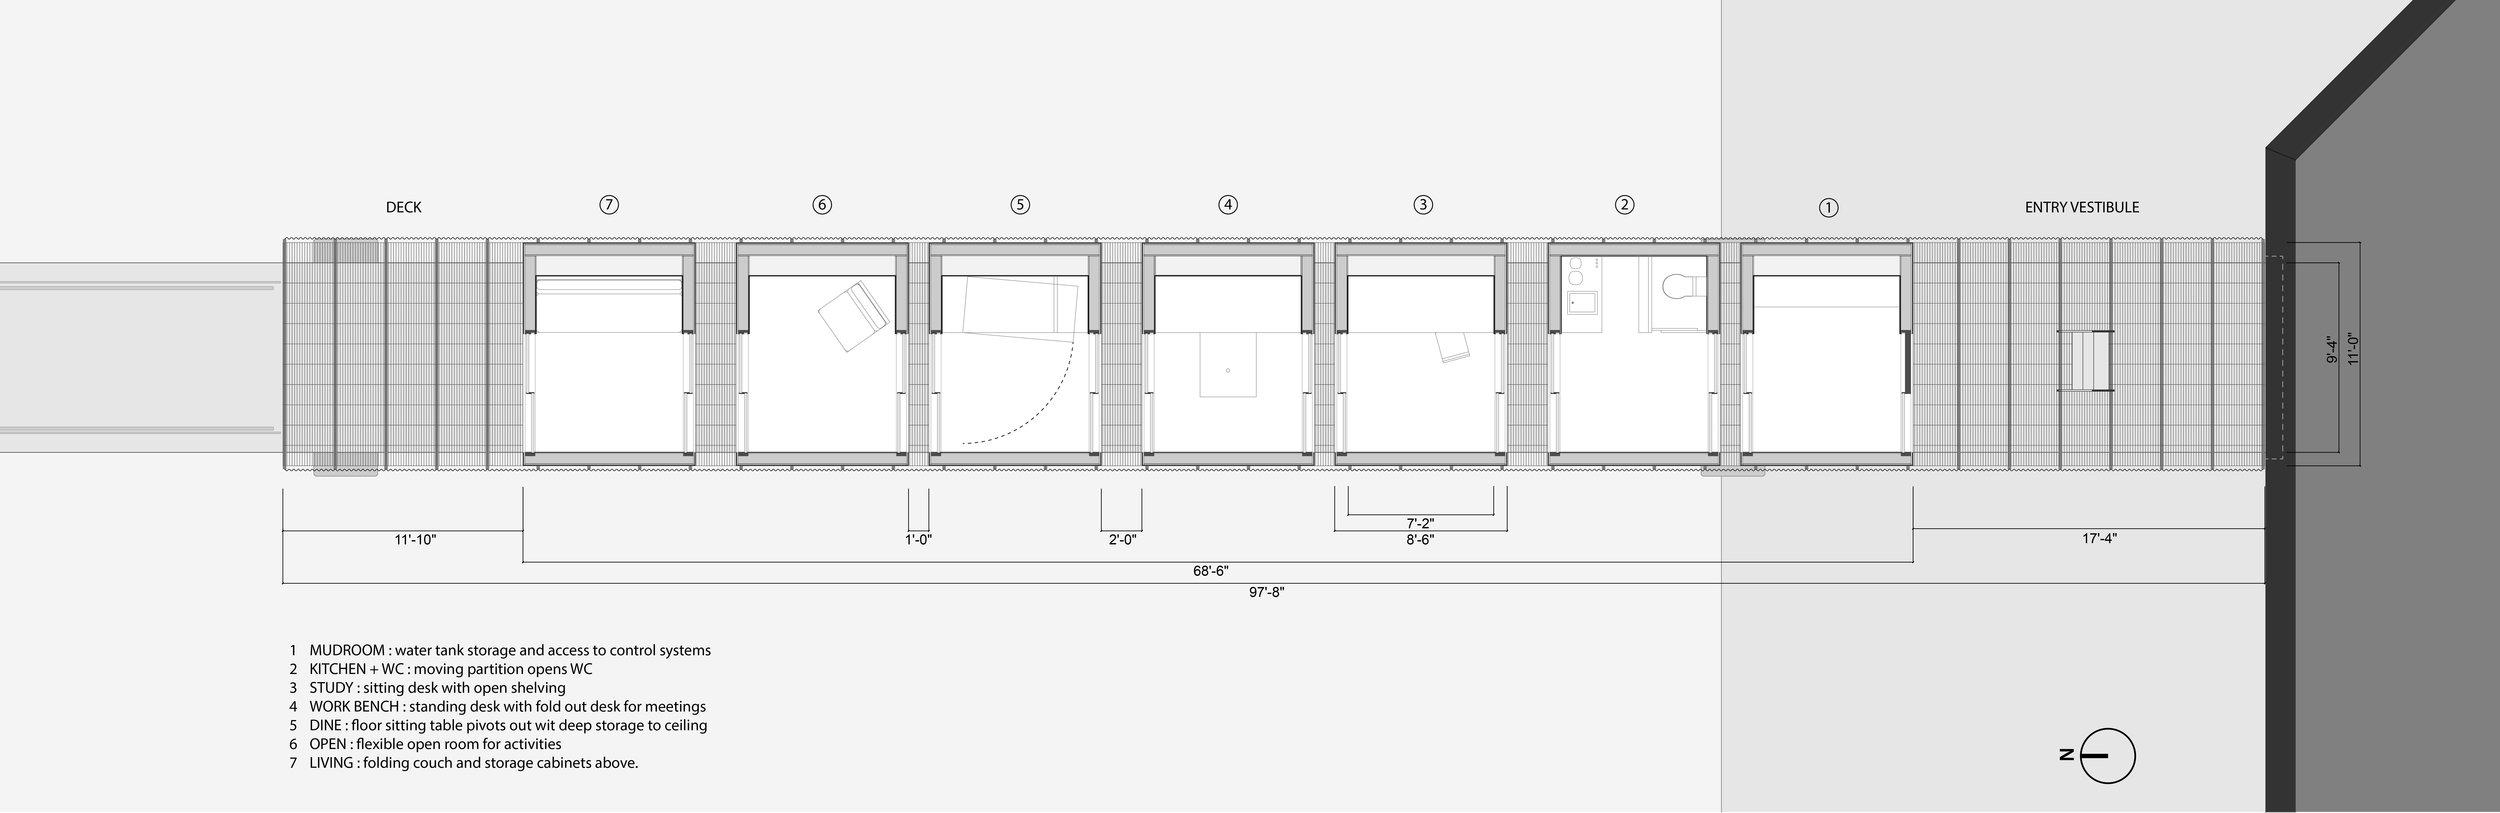 _B2N Studio - all linework [working]_PLAN.jpg